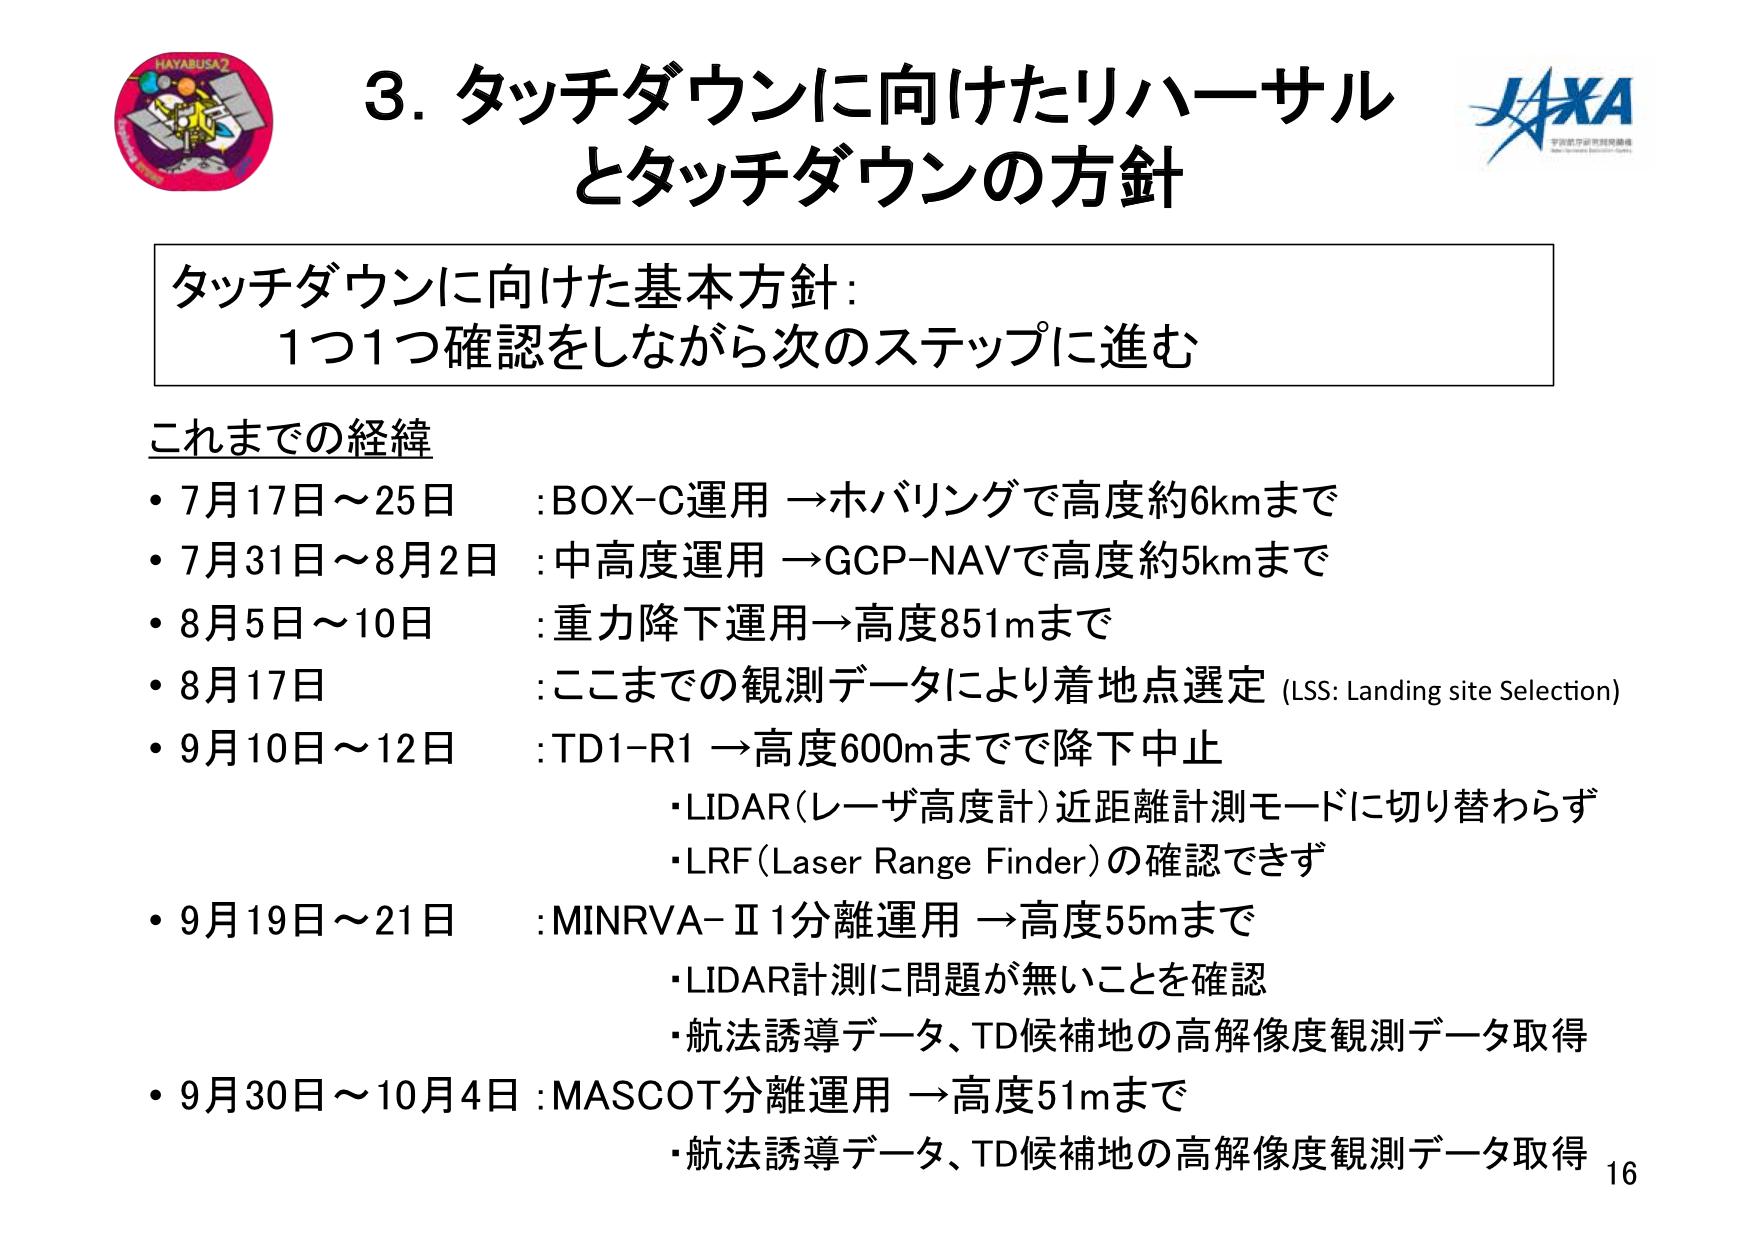 f:id:Imamura:20181011153955p:plain